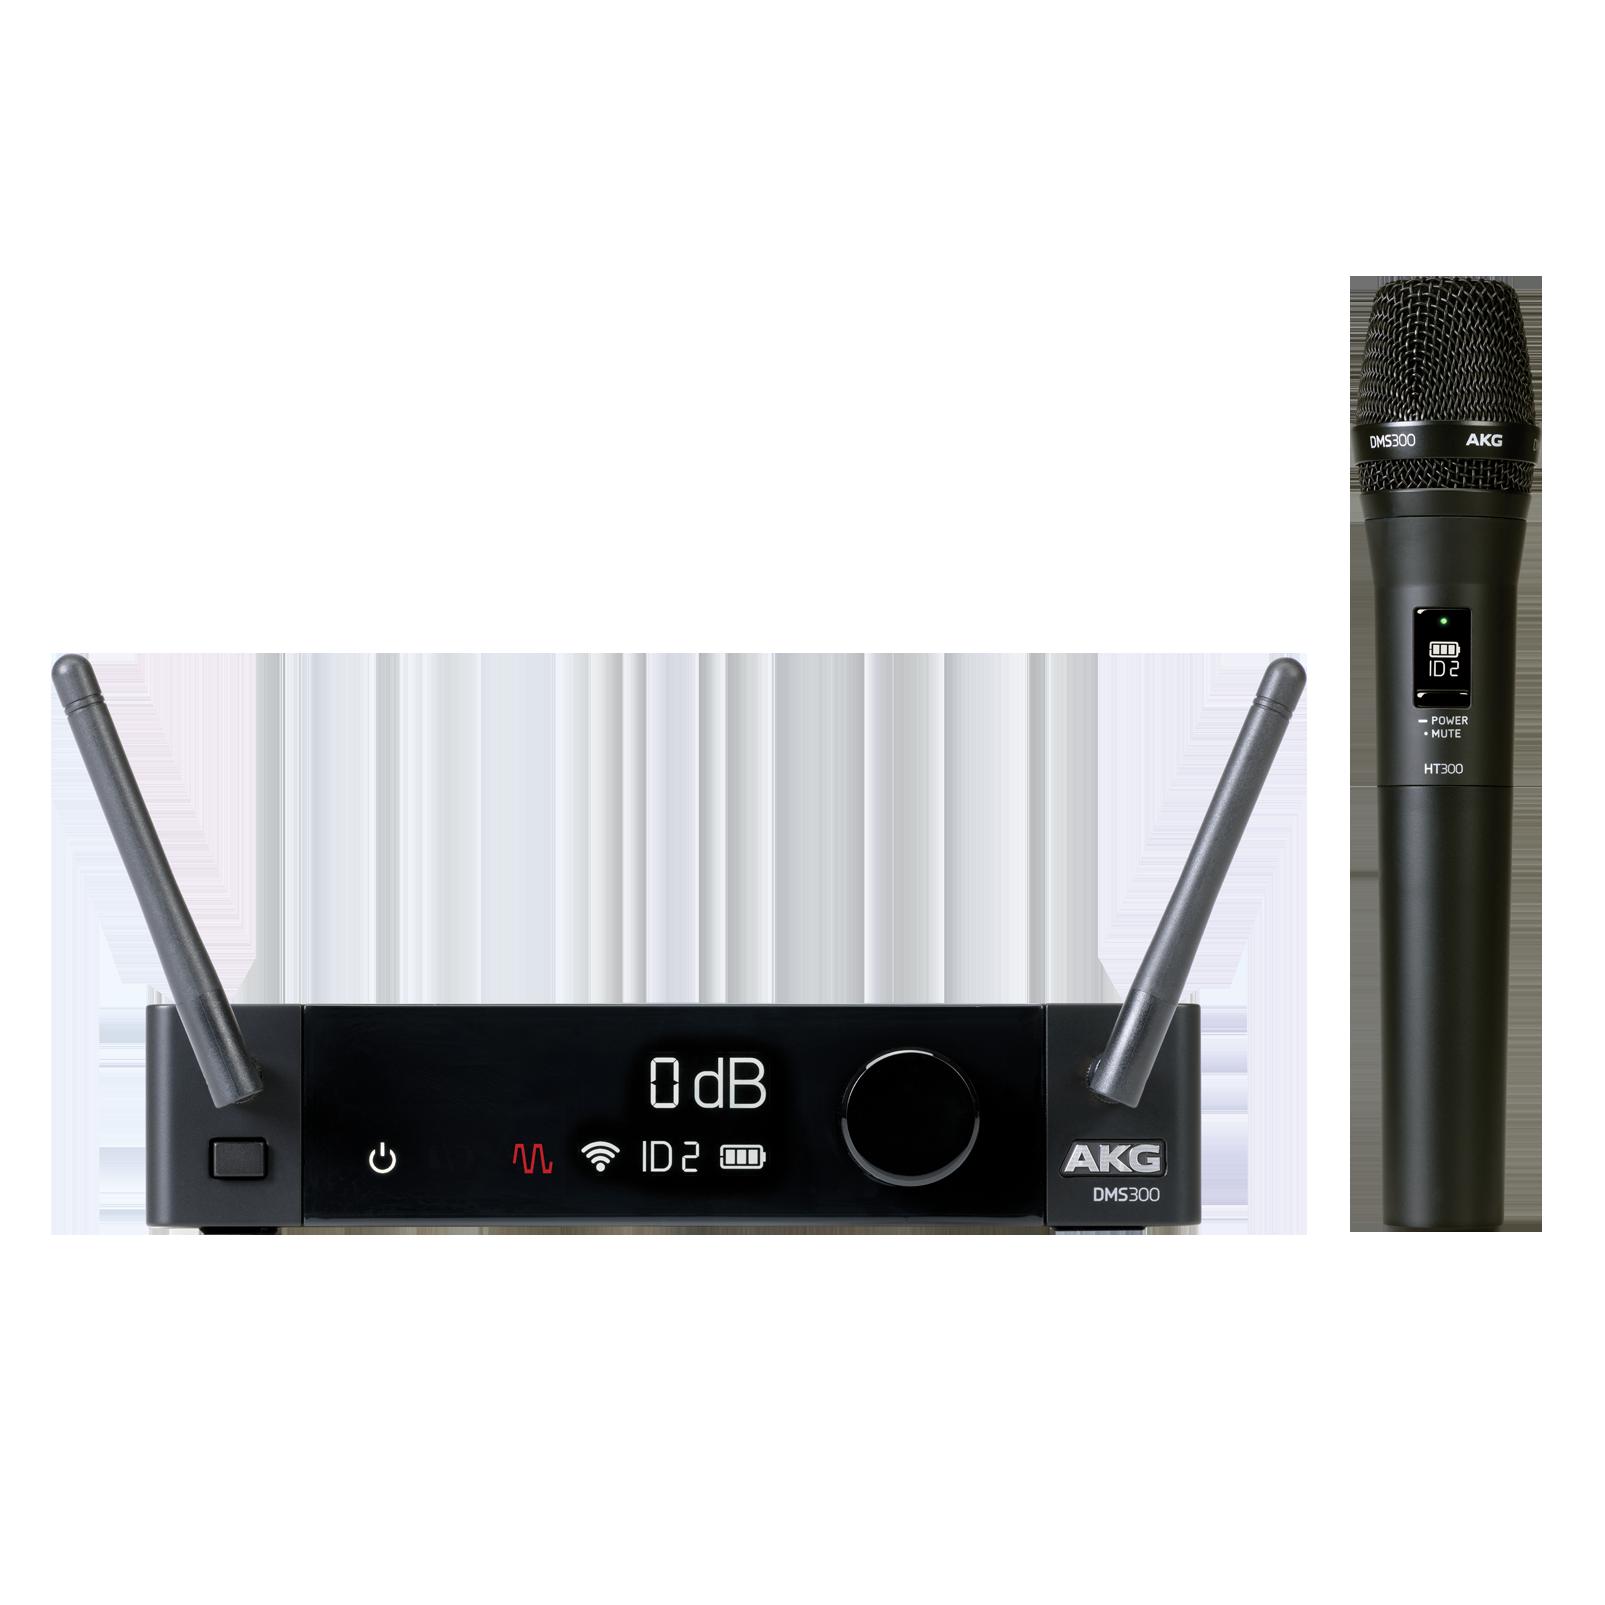 DMS300 Microphone Set - Black - Digital wireless microphone system - Hero